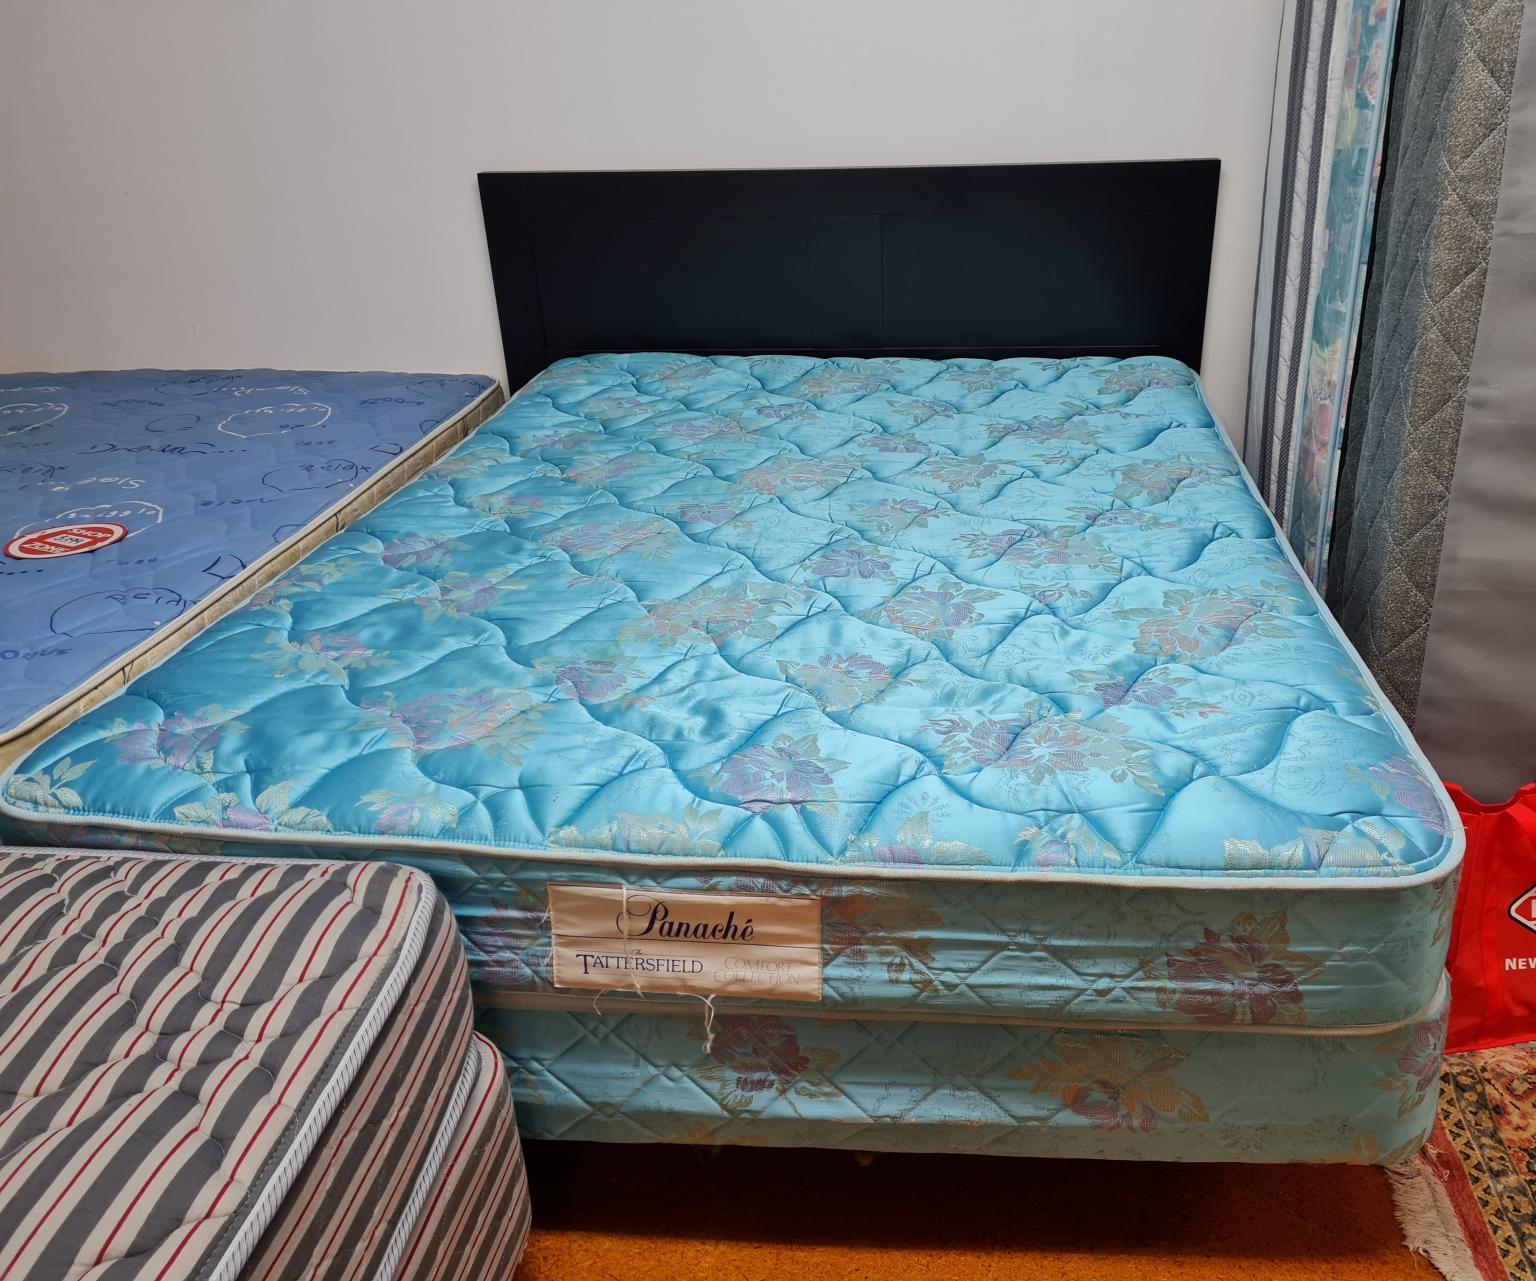 Tattersfield Panache Queen Bed Base and Mattress